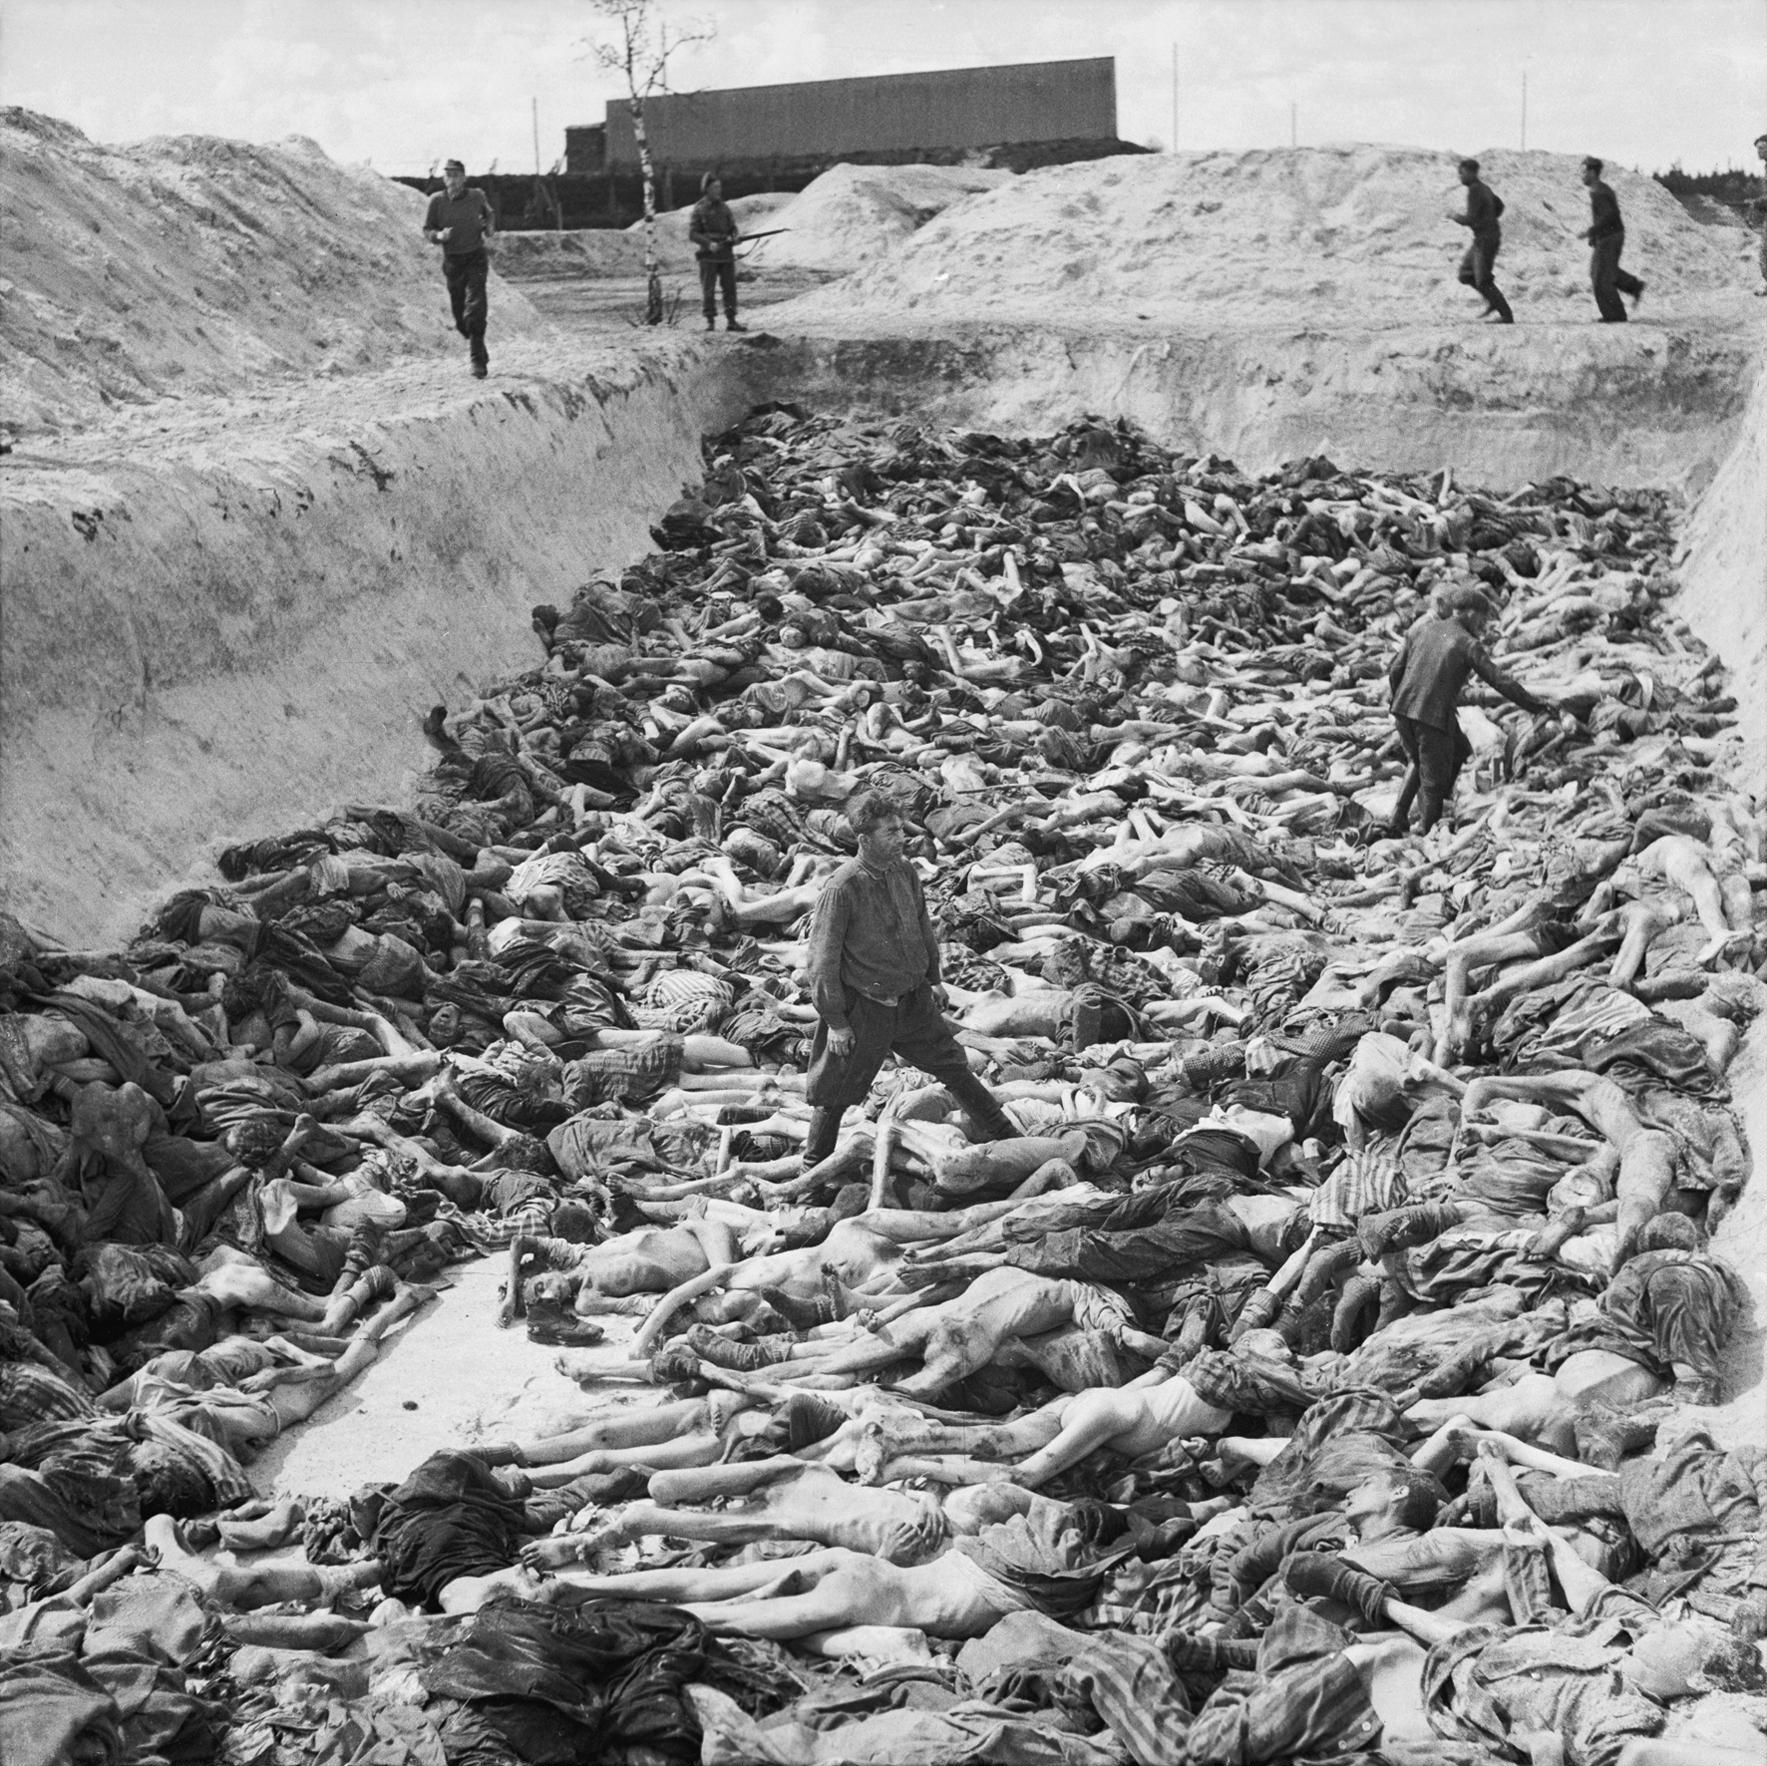 Holocausto - Wikipedia, la enciclopedia libre